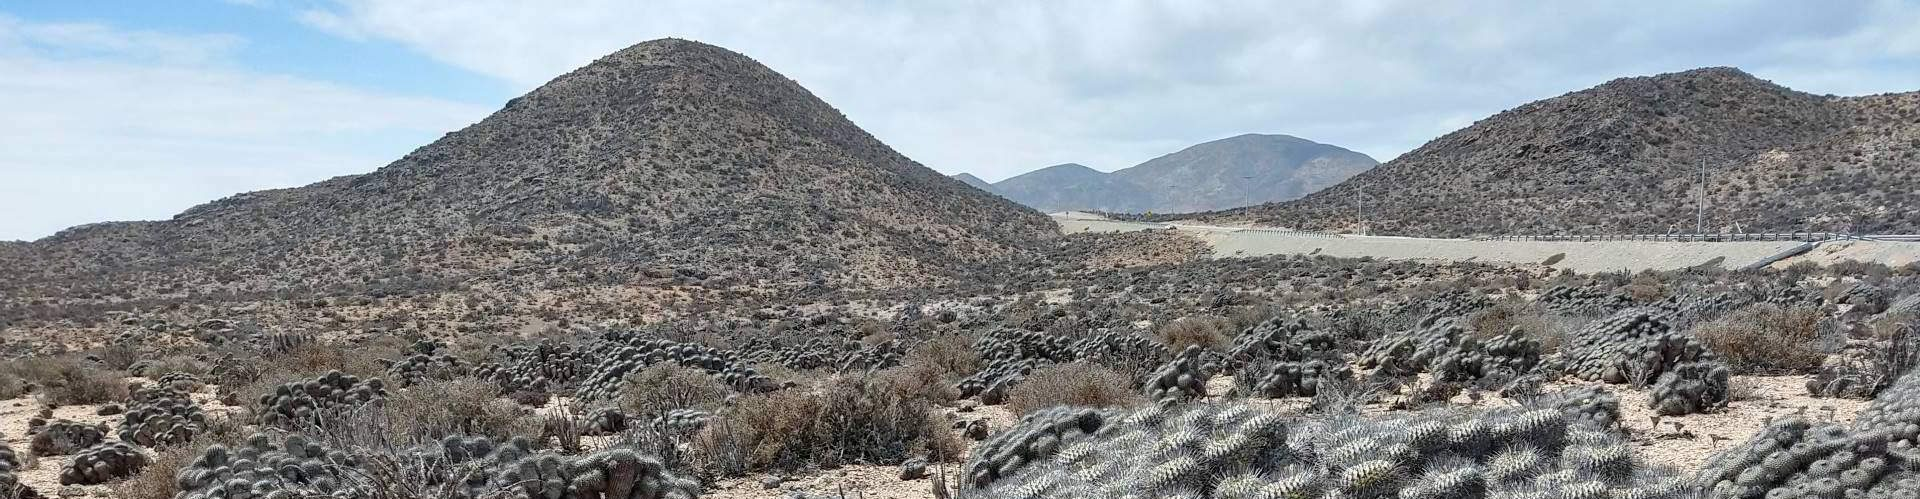 Carrizal-Bajo-Chile